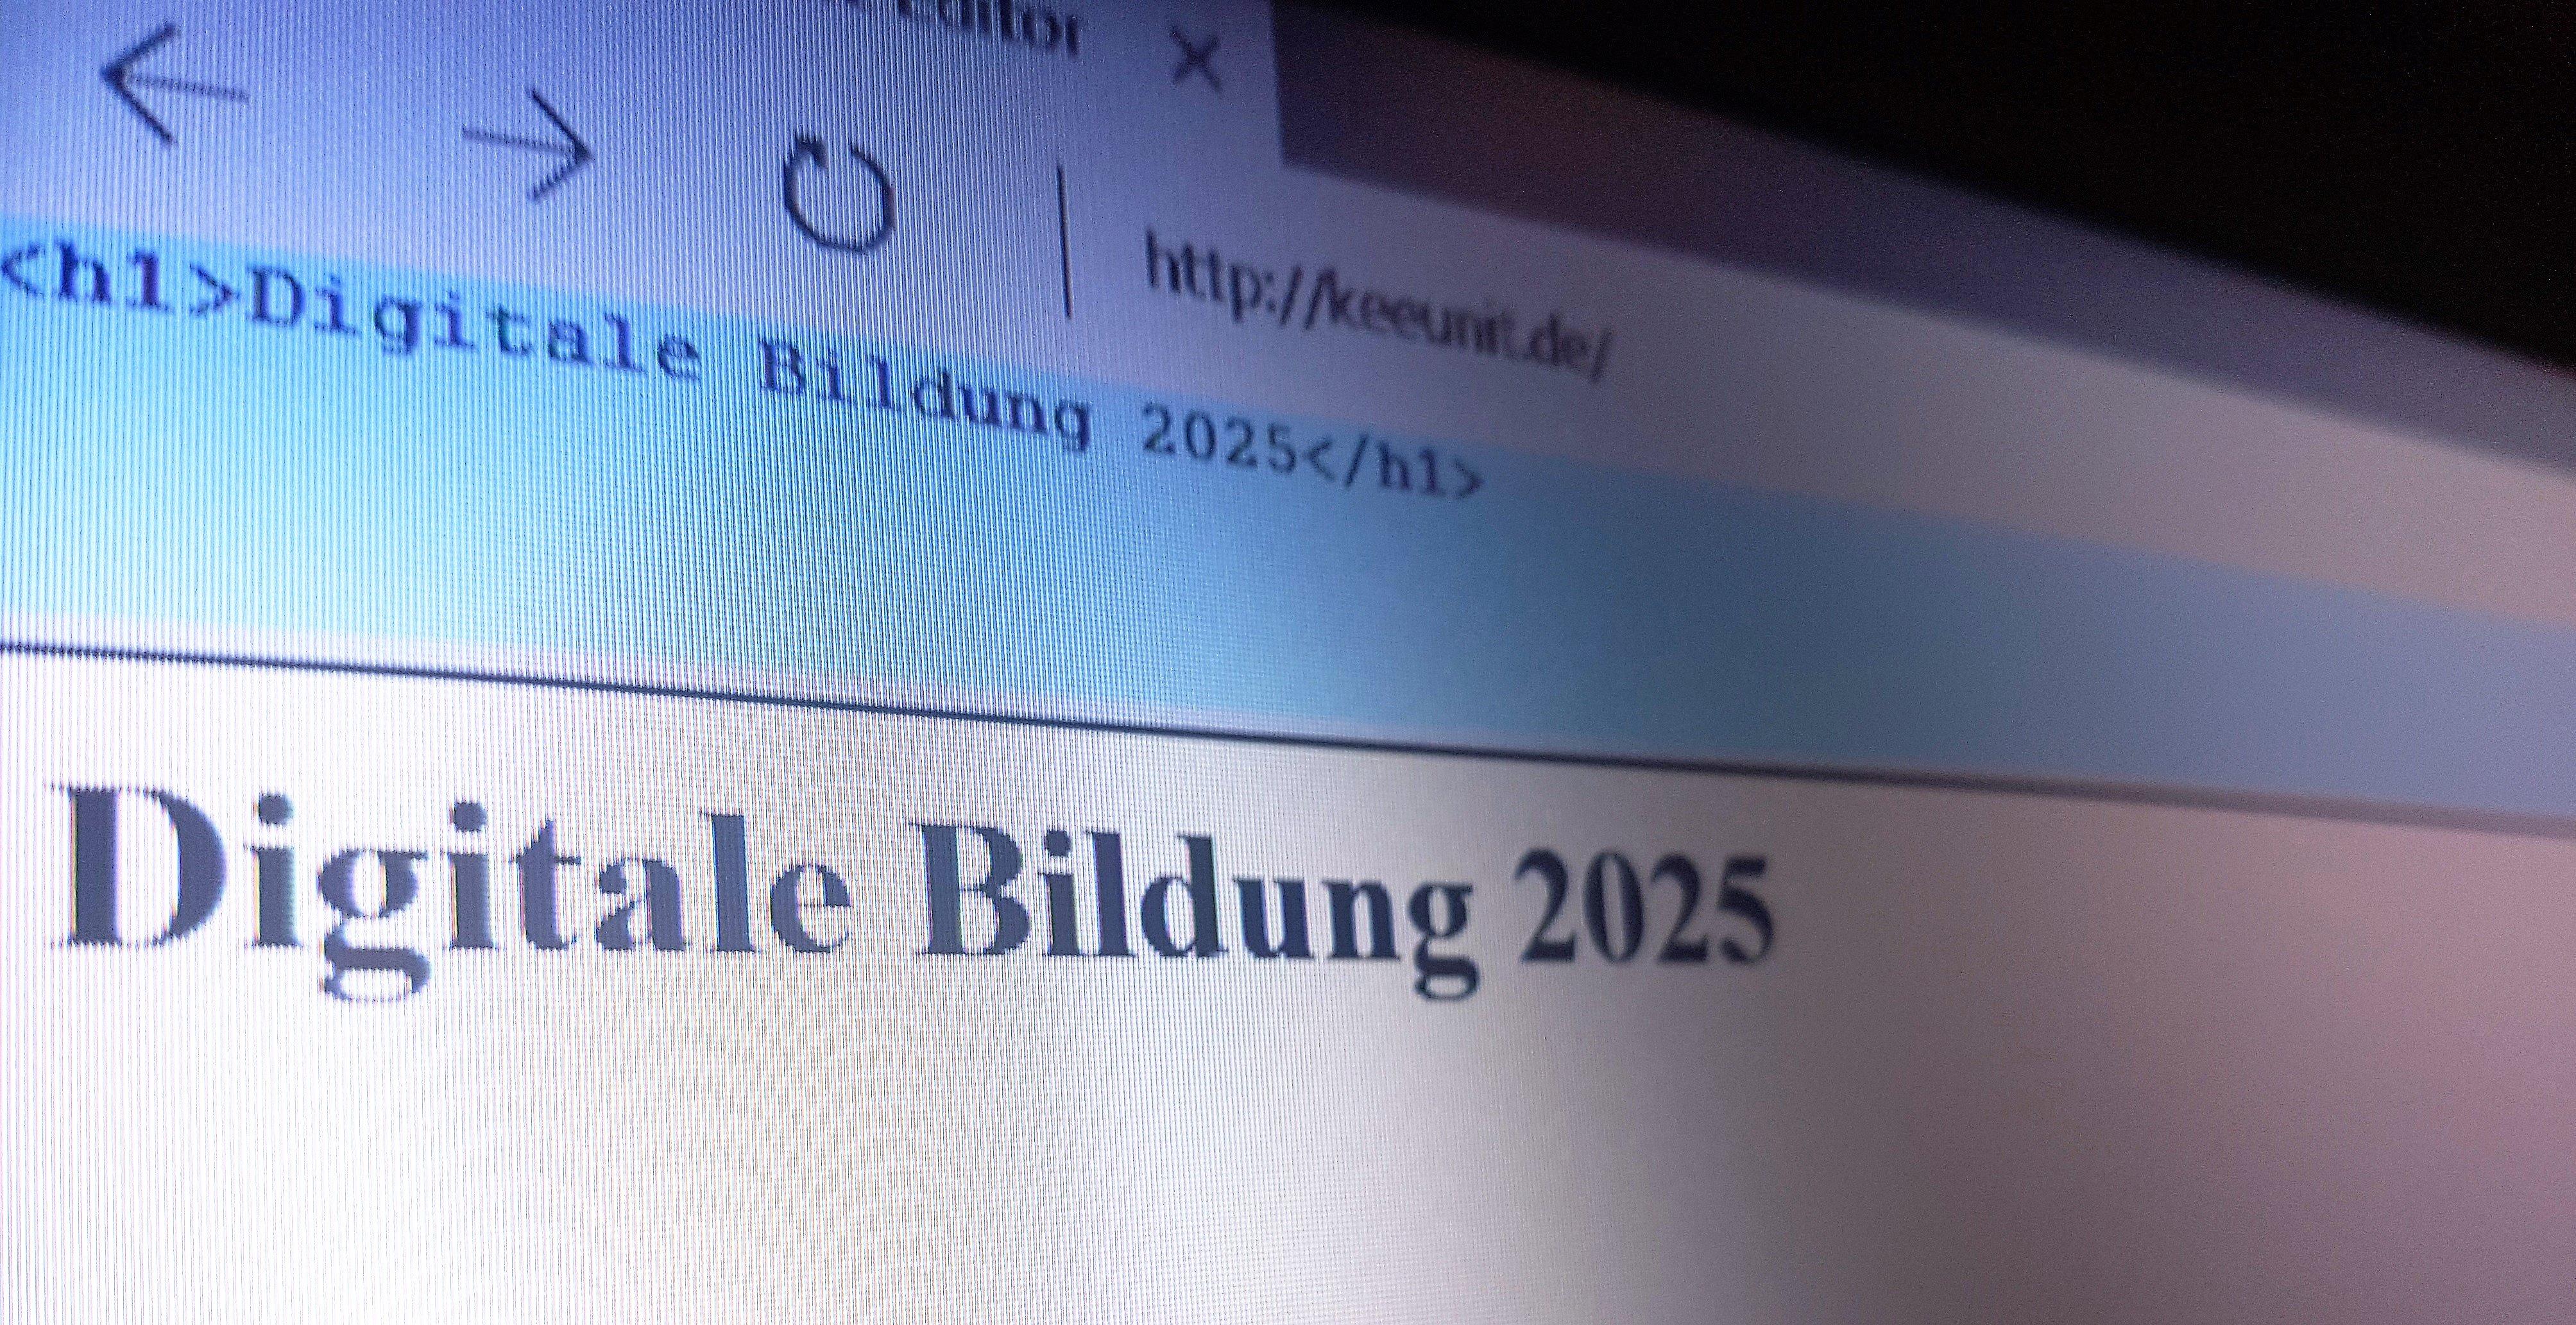 Image Digitale_Bildung_2025